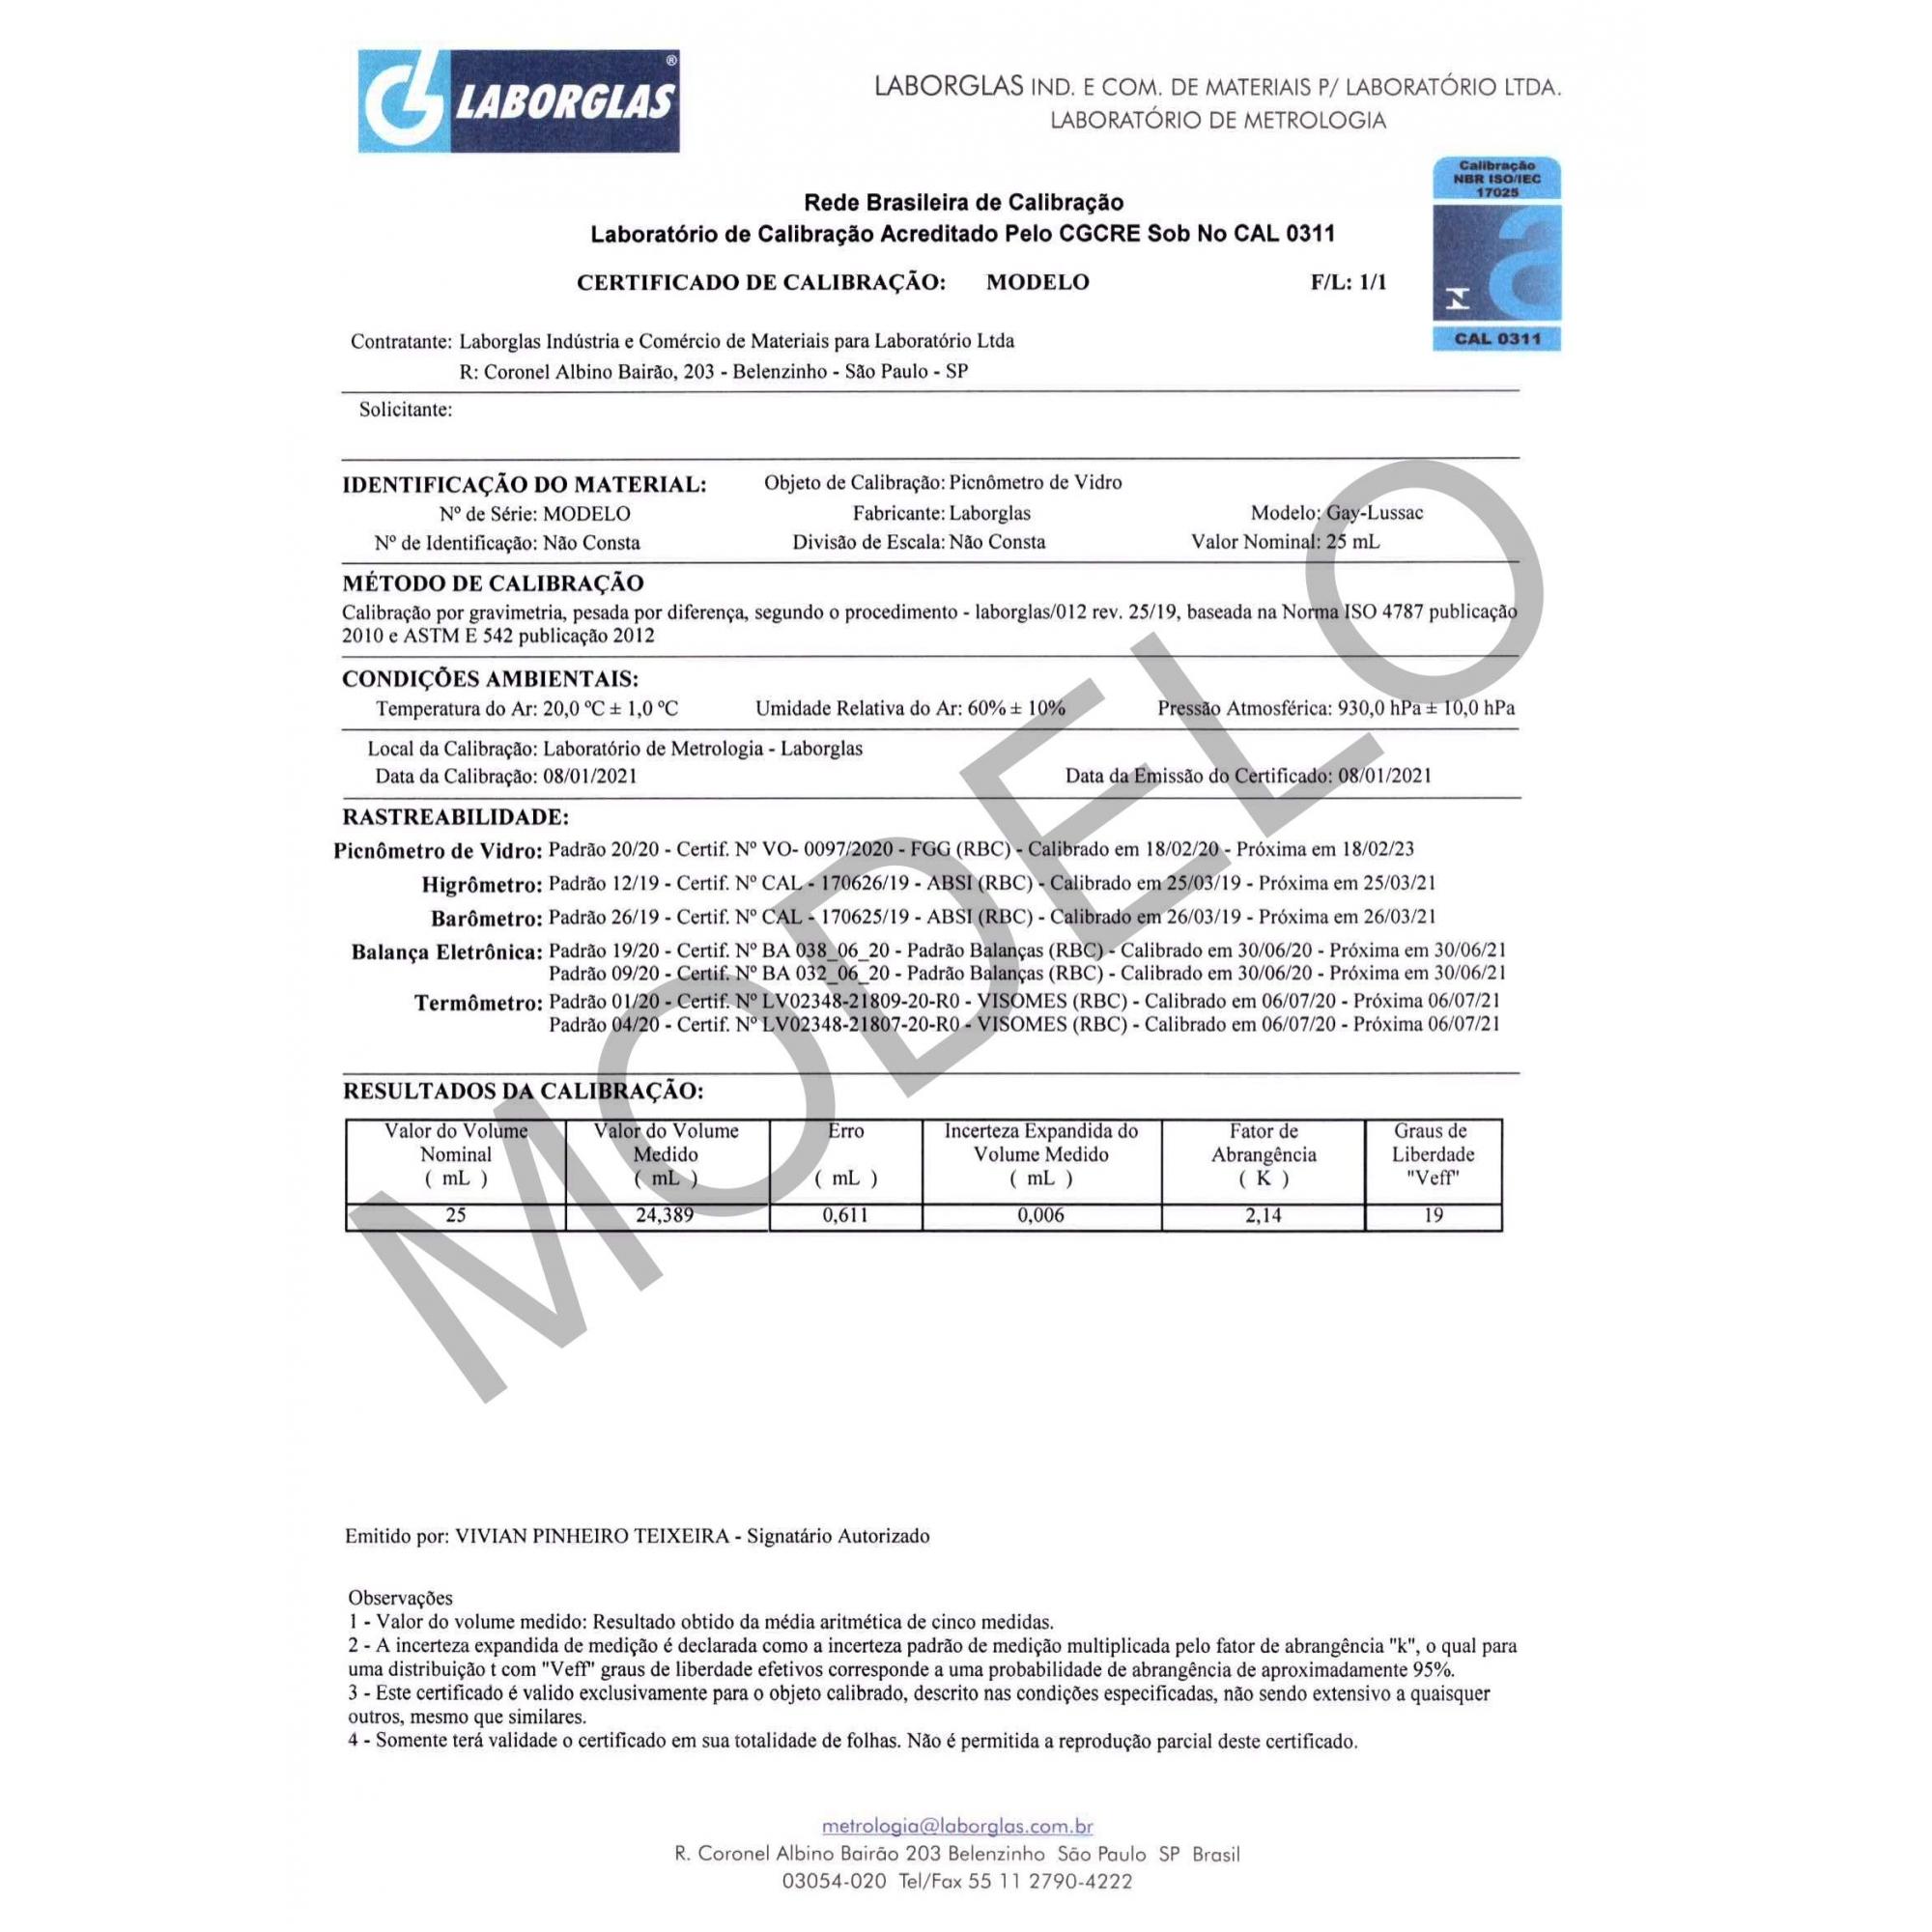 PICNÔMETRO GAY-LUSSAC SEM TERMÔMETRO 5 ML CERTIFICADO RBC - Laborglas - Cód. 9491107-R